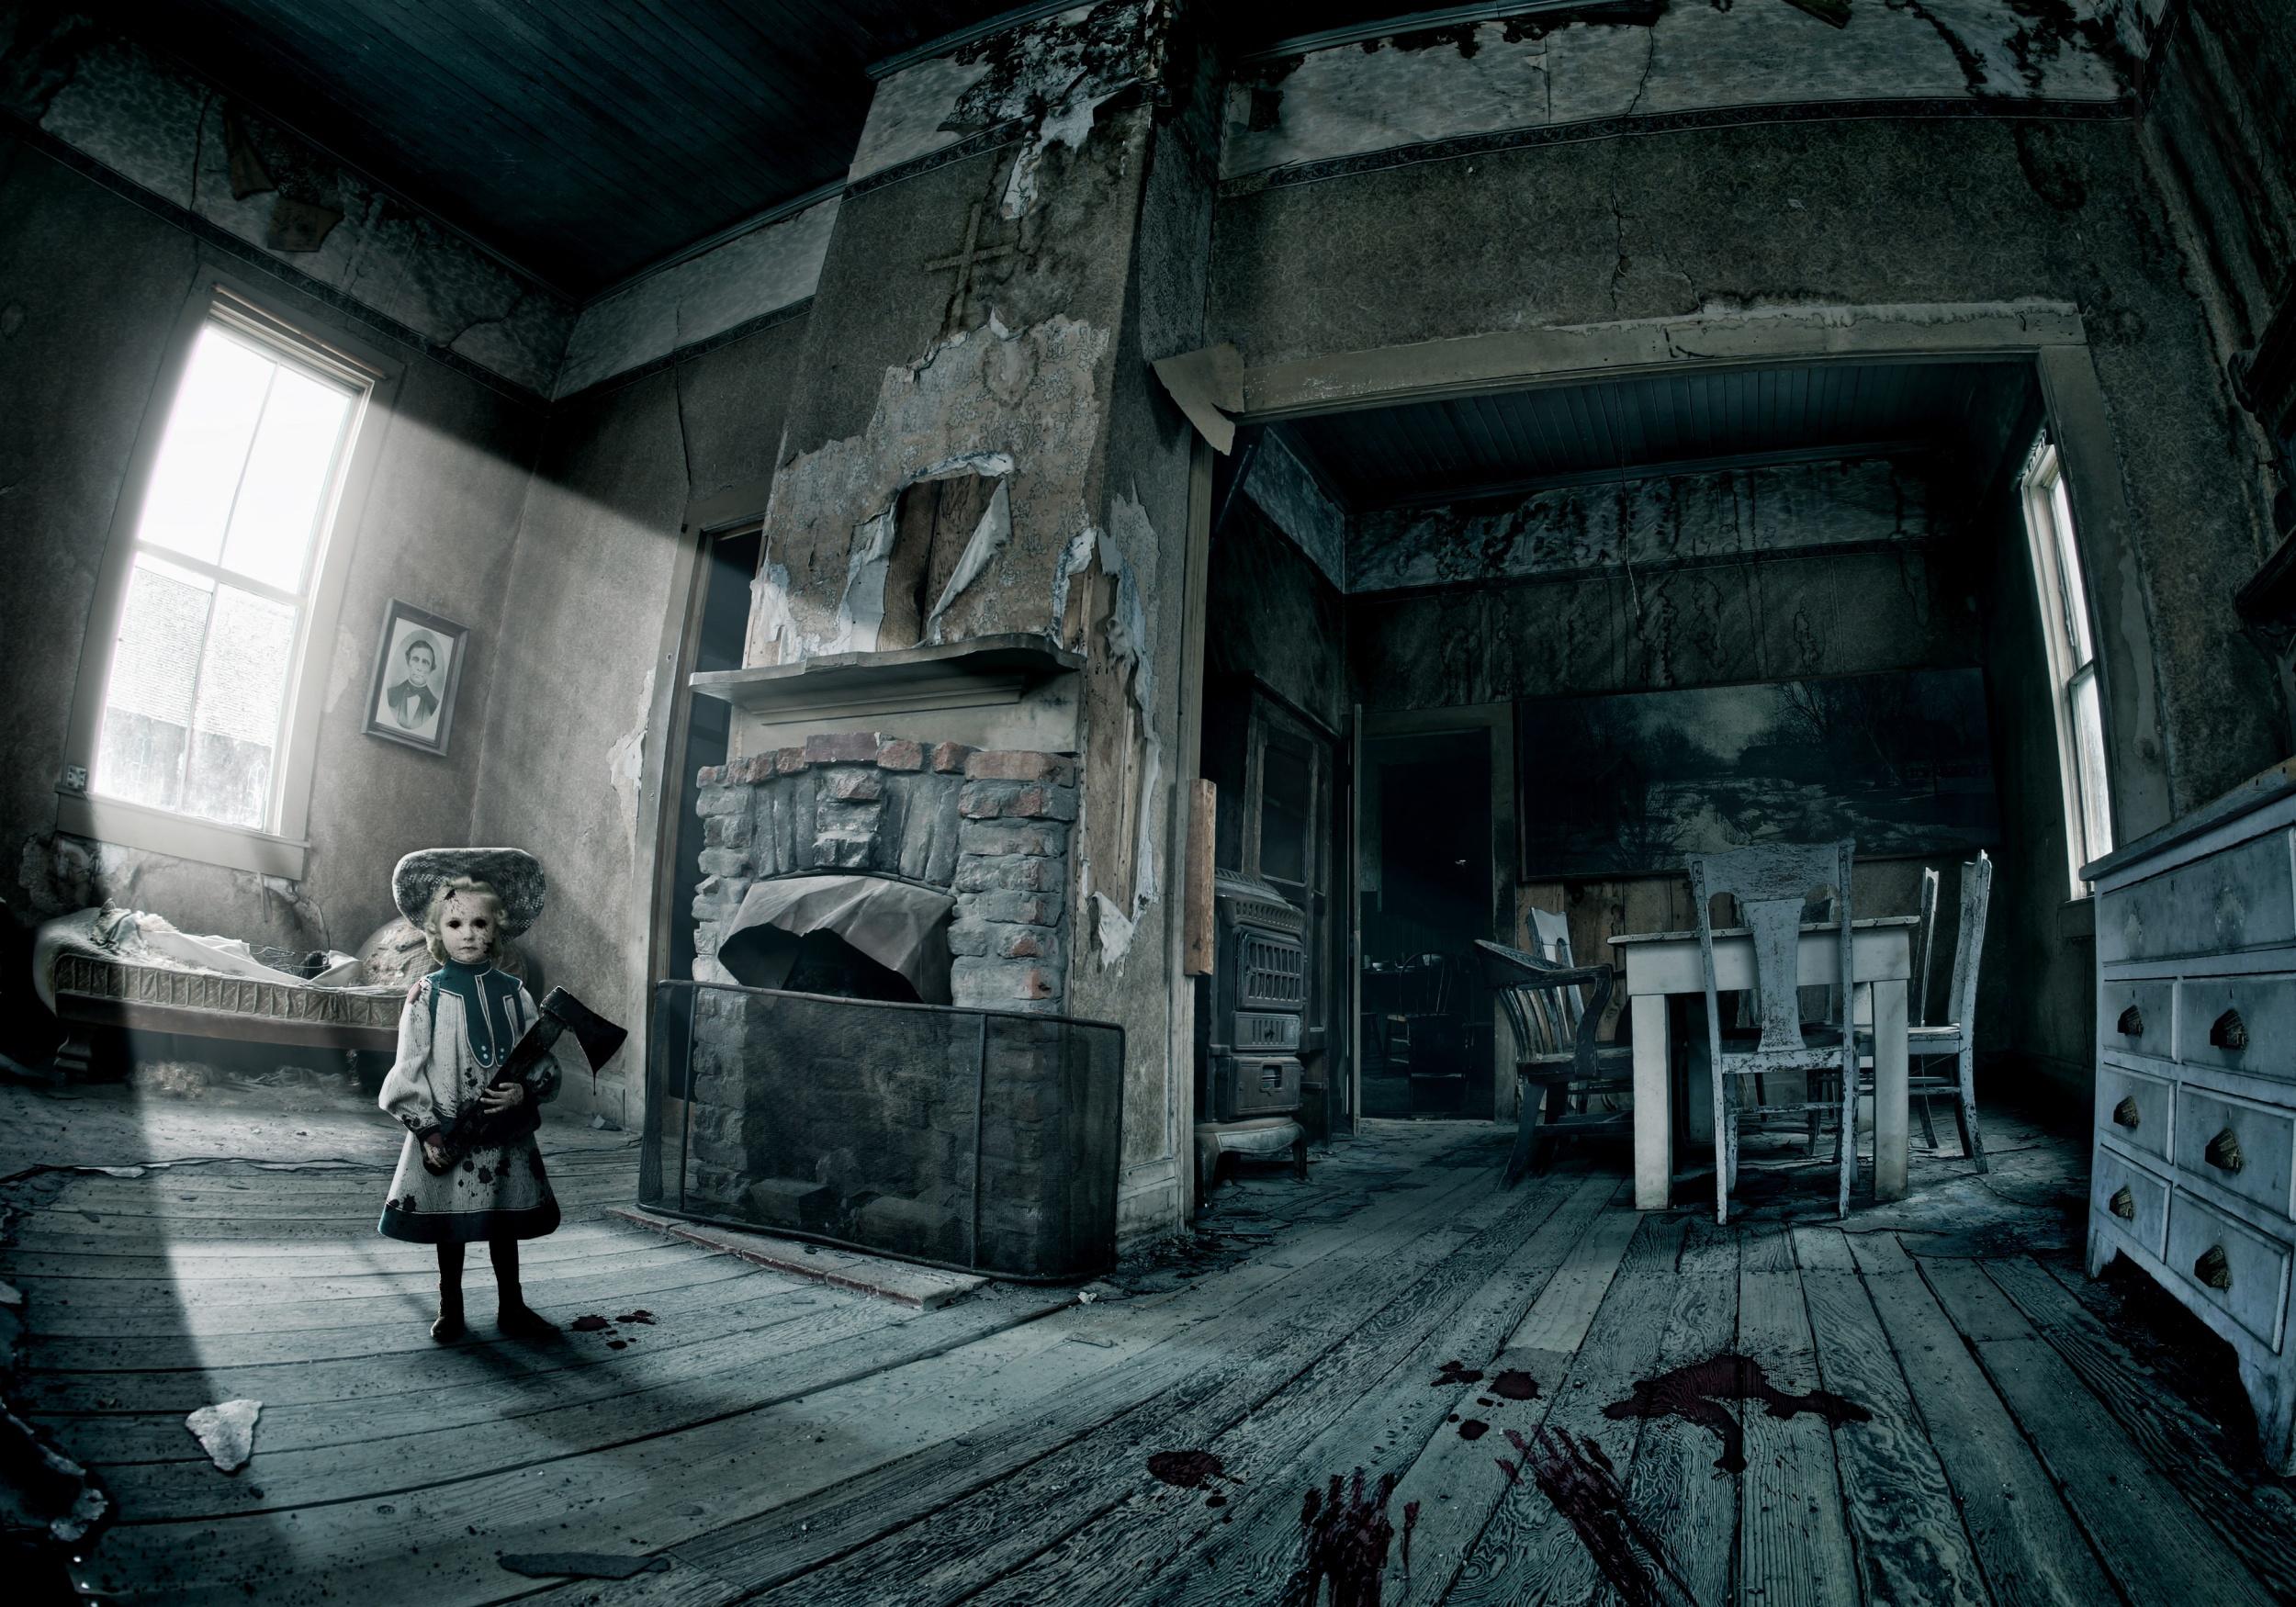 ghost doll haunted house ax blood window sunlight hd wallpaper 2500x1750